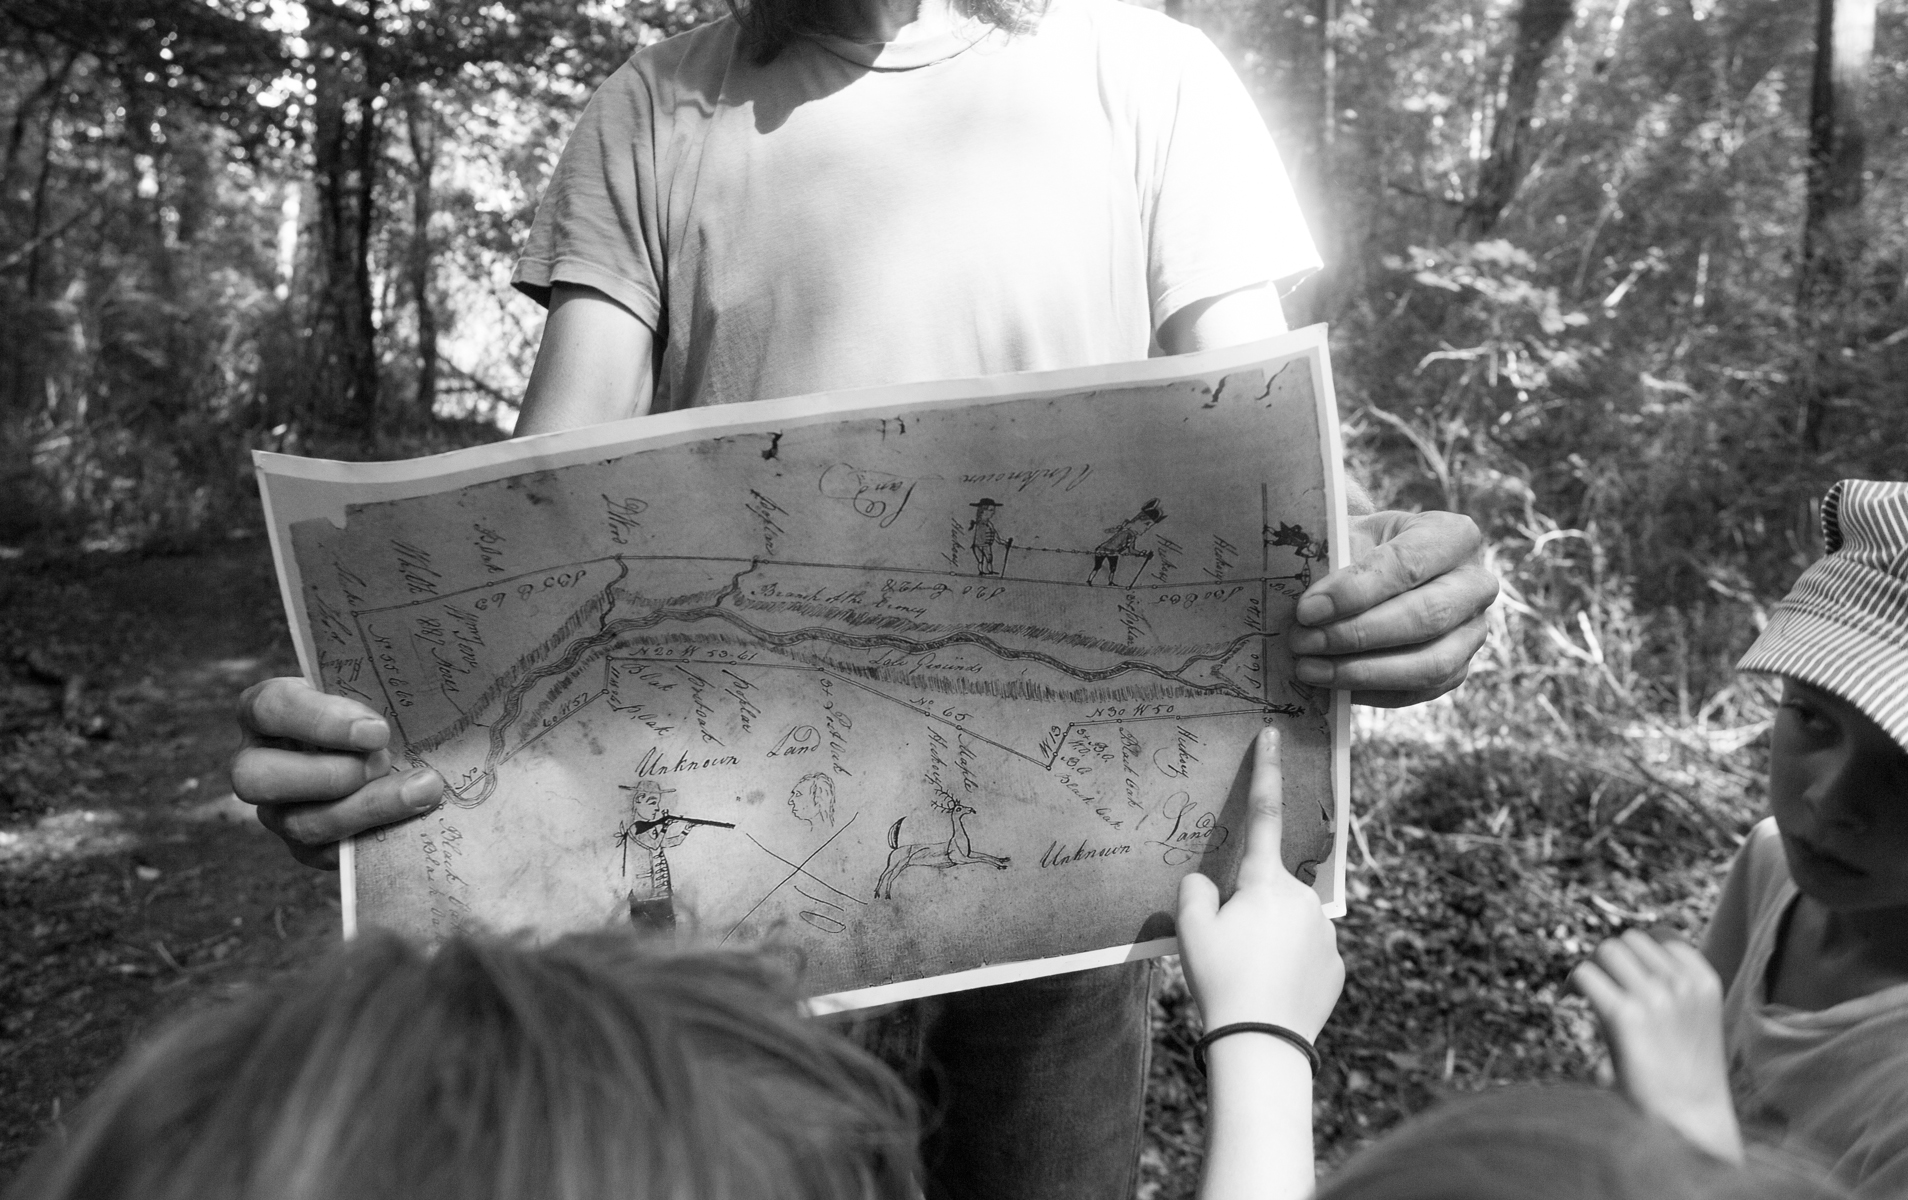 RA_story of the land camp-201606297988.jpg